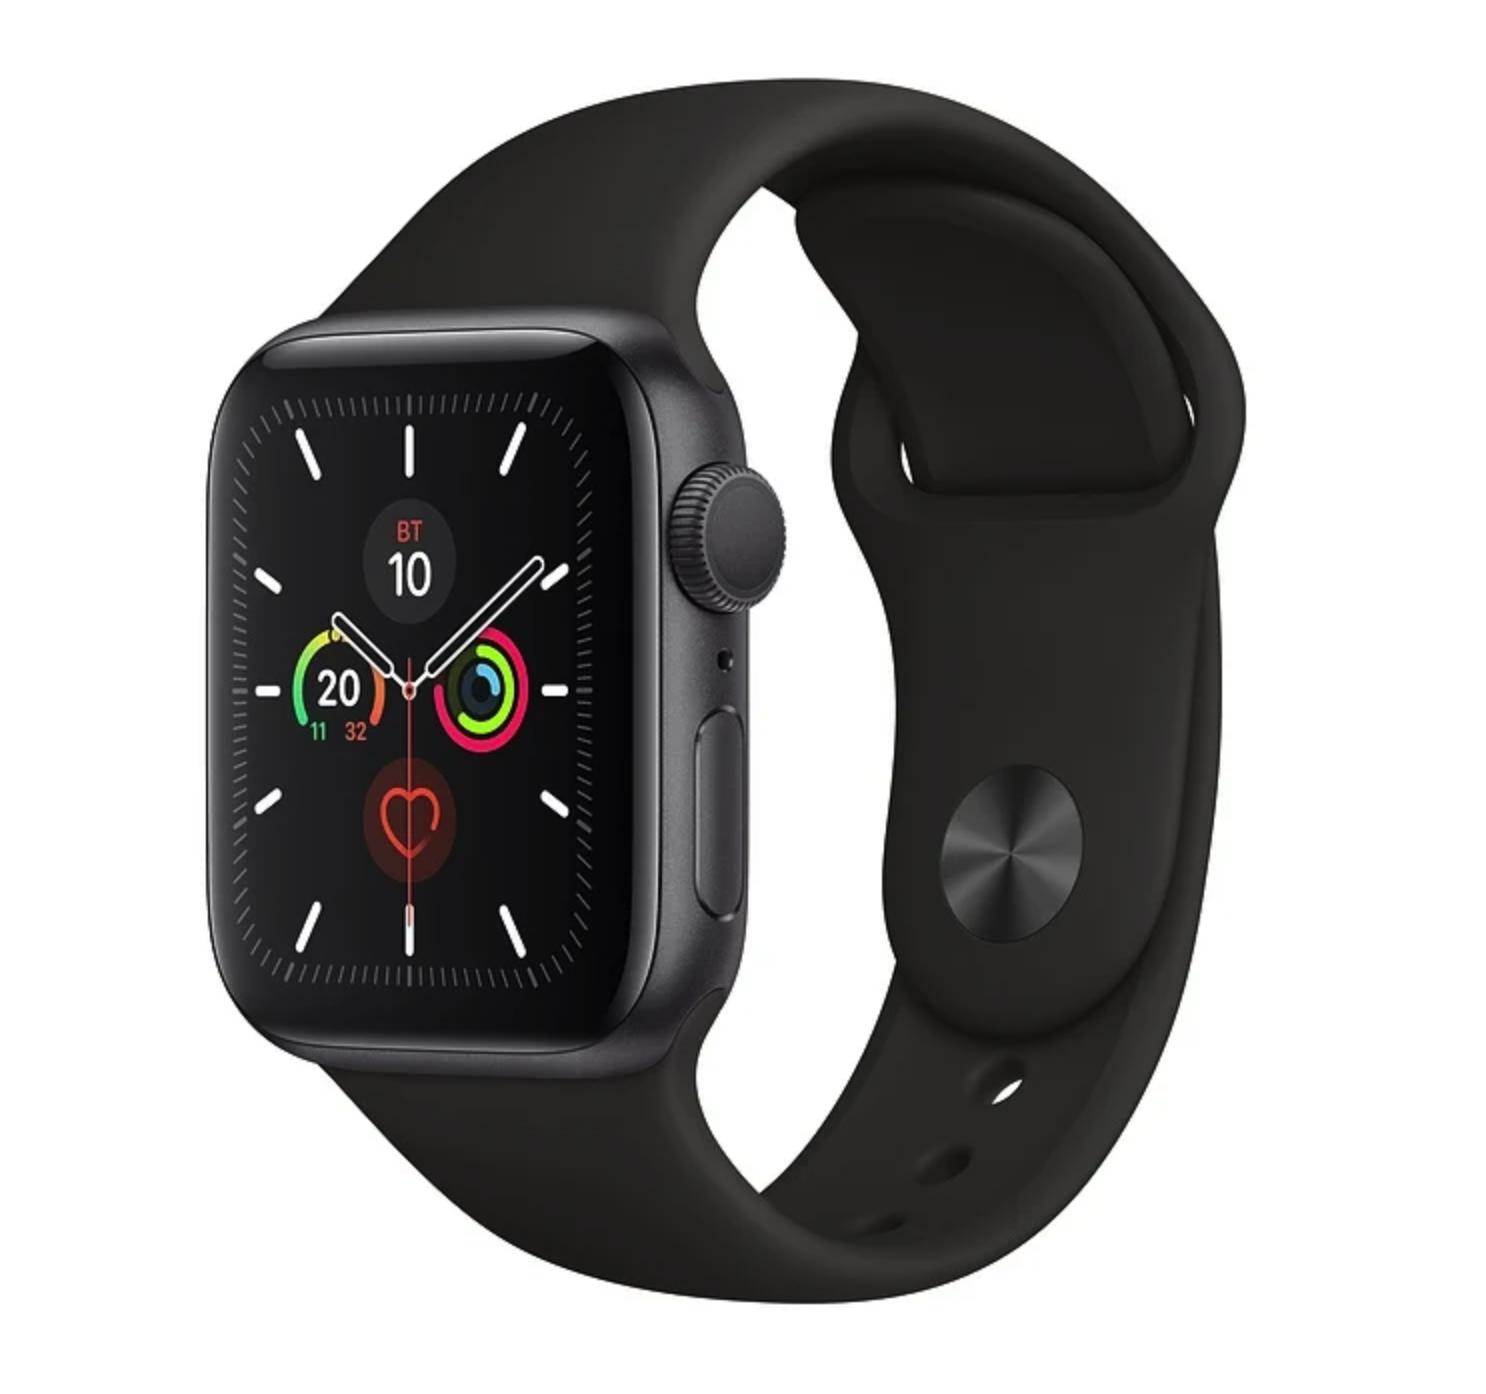 Часы Apple Watch Series 5 GPS 44mm Aluminum Case with Sport Band Space Grey (серый космос/черный)